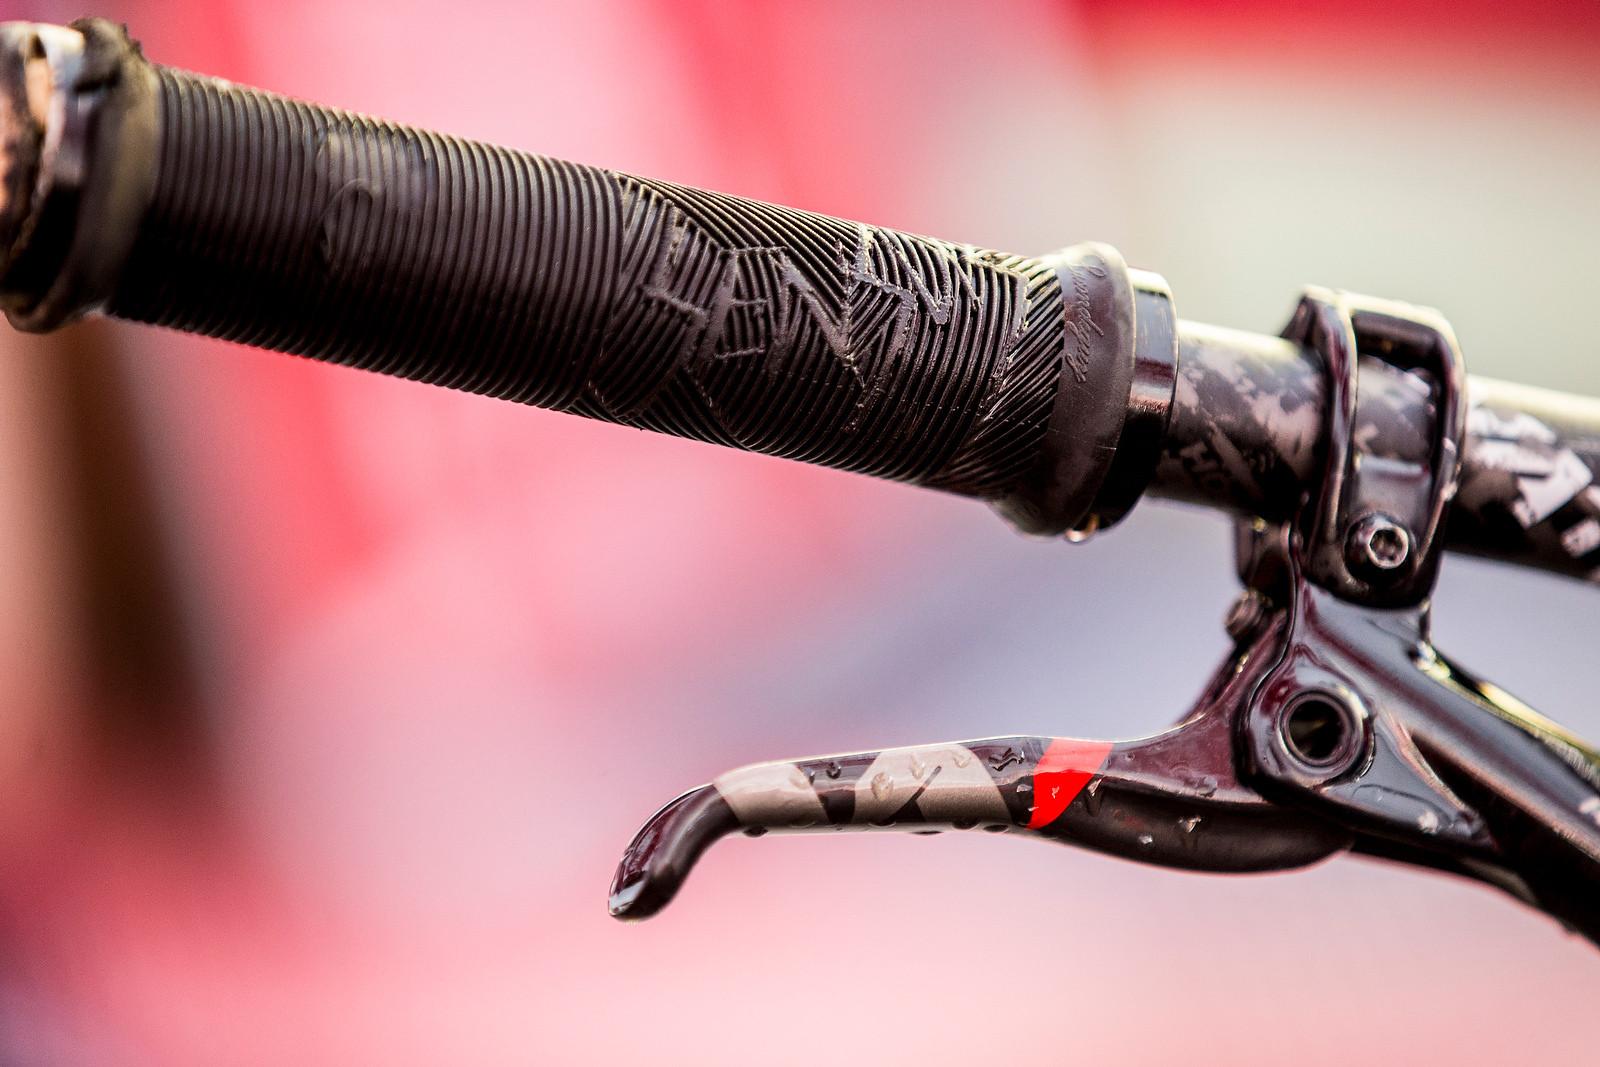 WINNING BIKE: Anthony Messere's Morpheus Vimana Slope - WINNING BIKE: Anthony Messere's Morpheus Vimana - Mountain Biking Pictures - Vital MTB